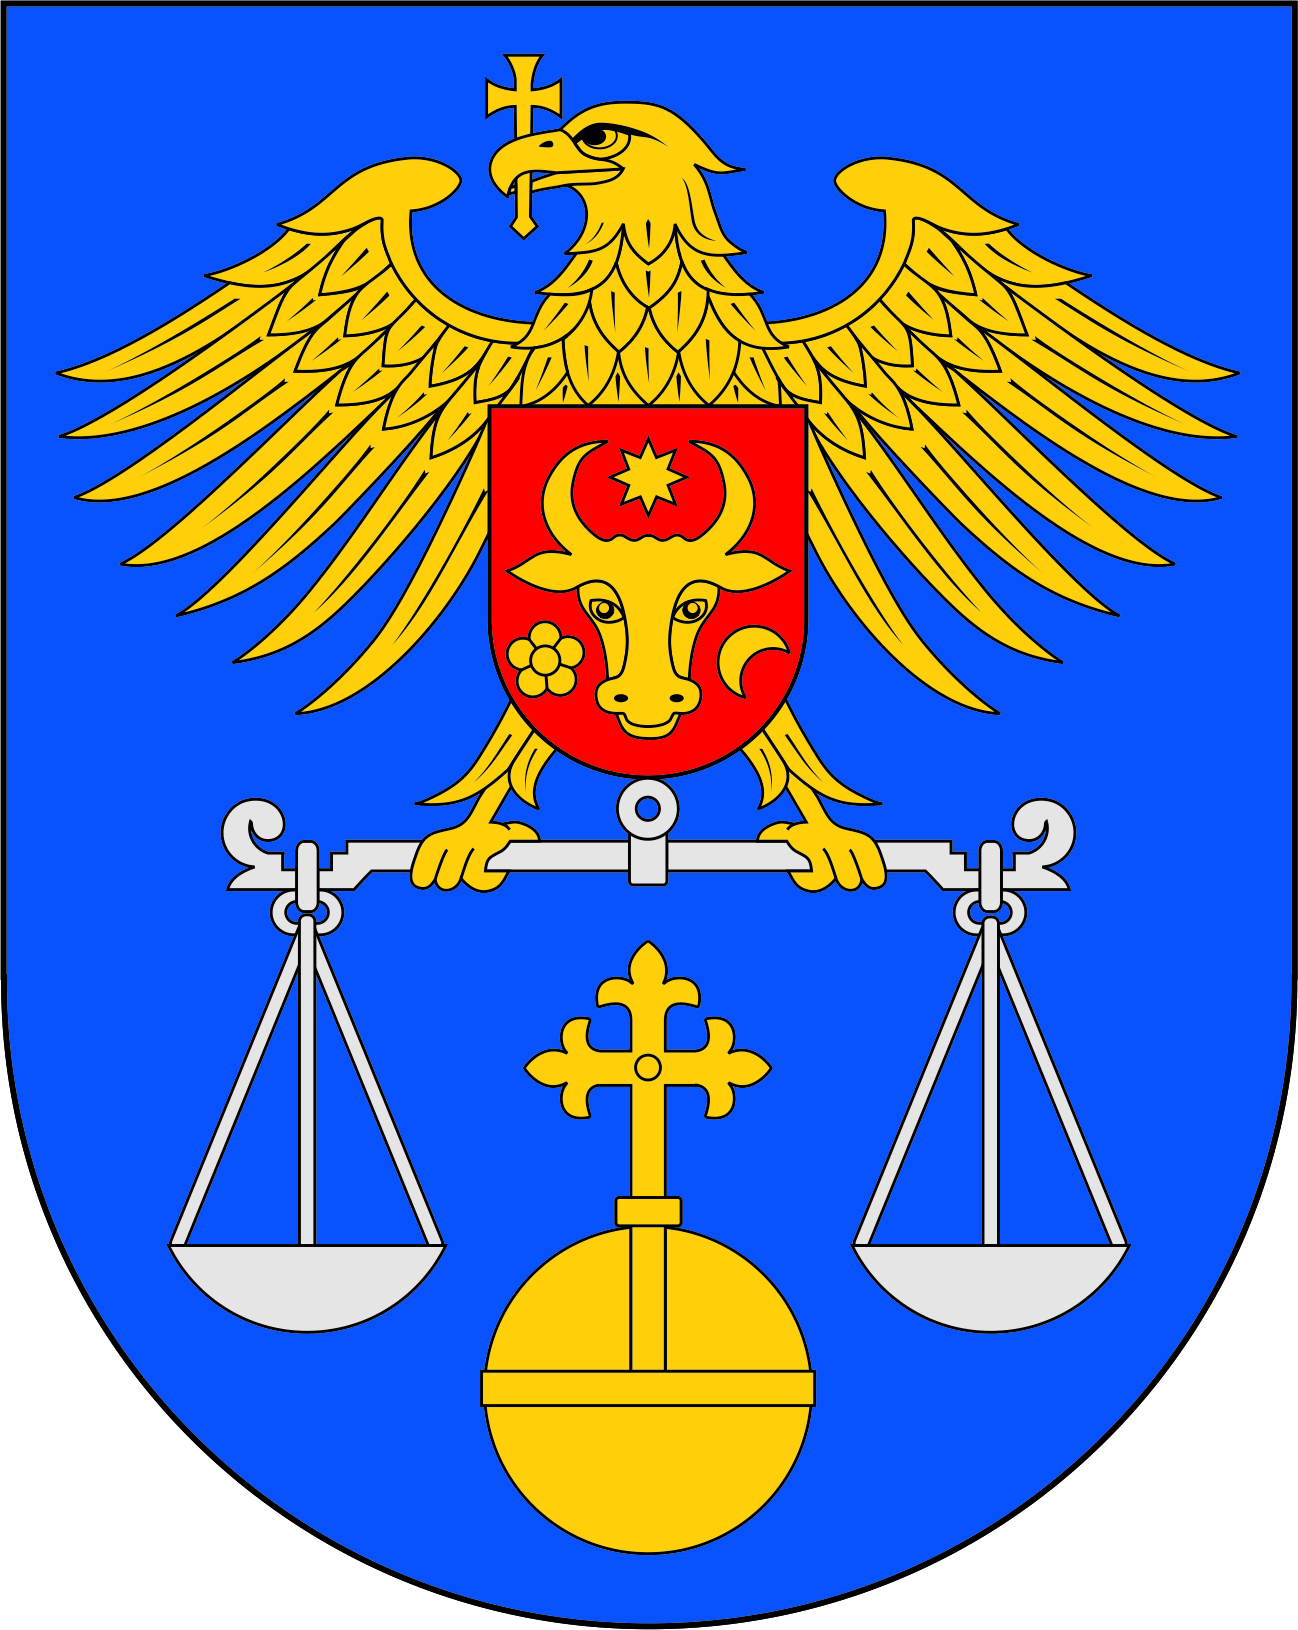 Curtea de Apel Galați